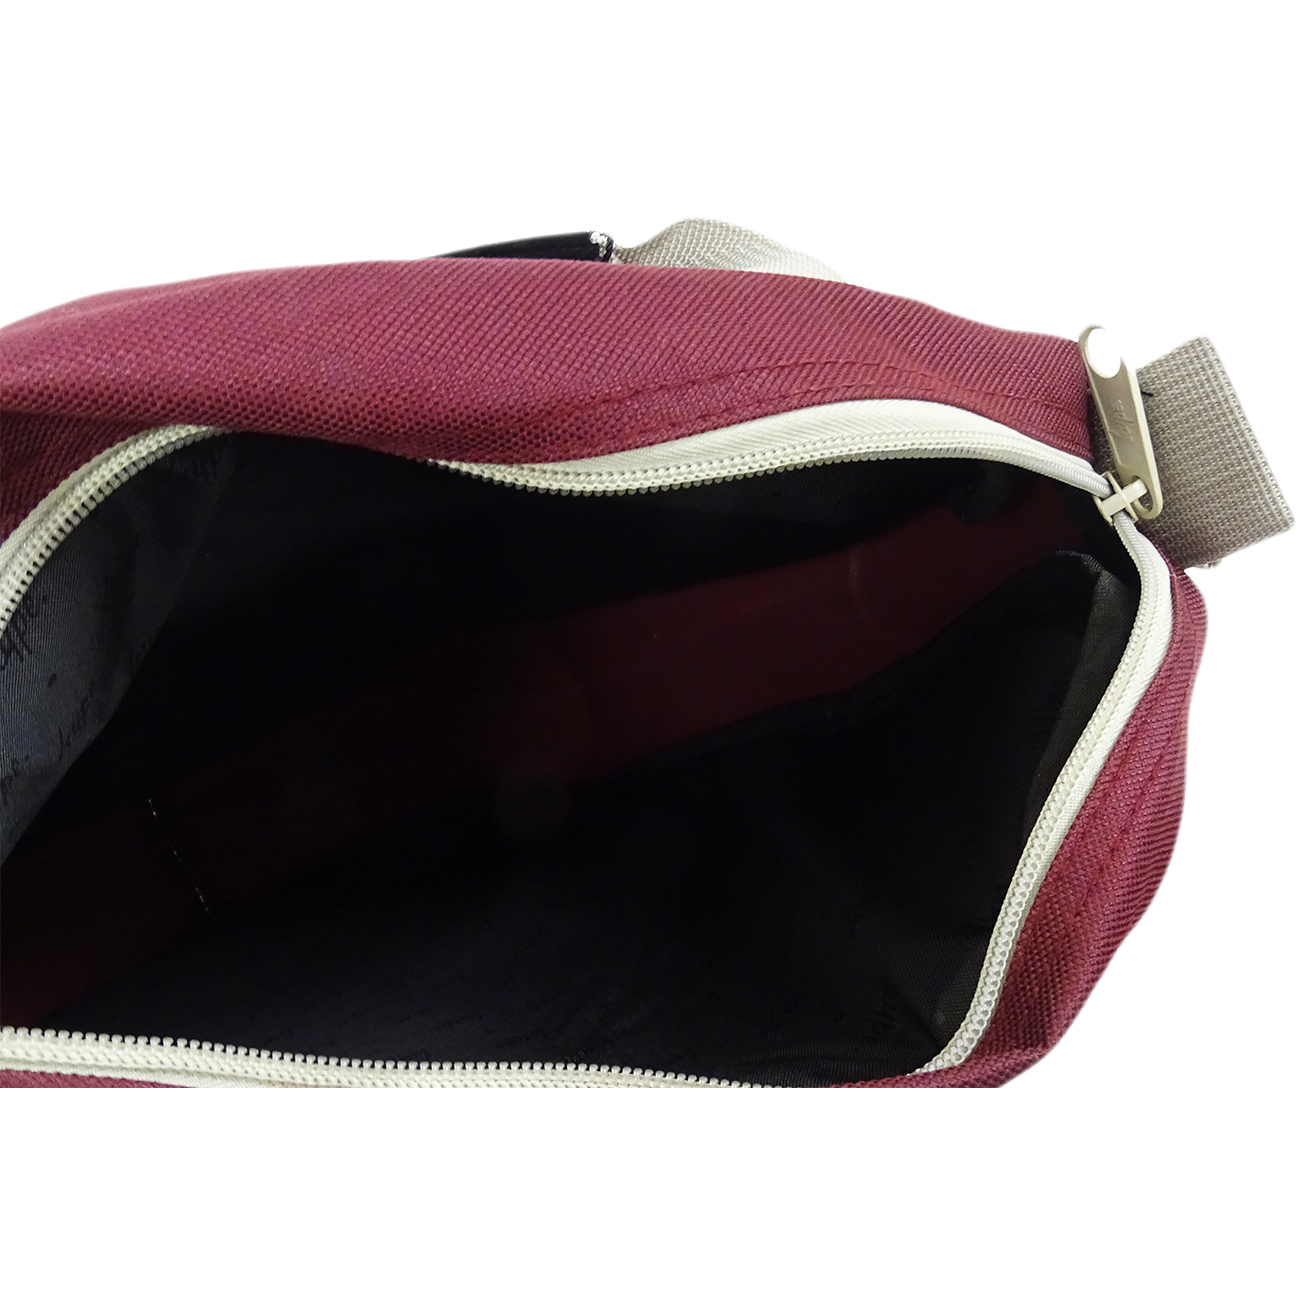 Unisexe-Hype-Sac-A-Dos-Ecole-Gym-SACS-pochettes-pencil-case miniature 125